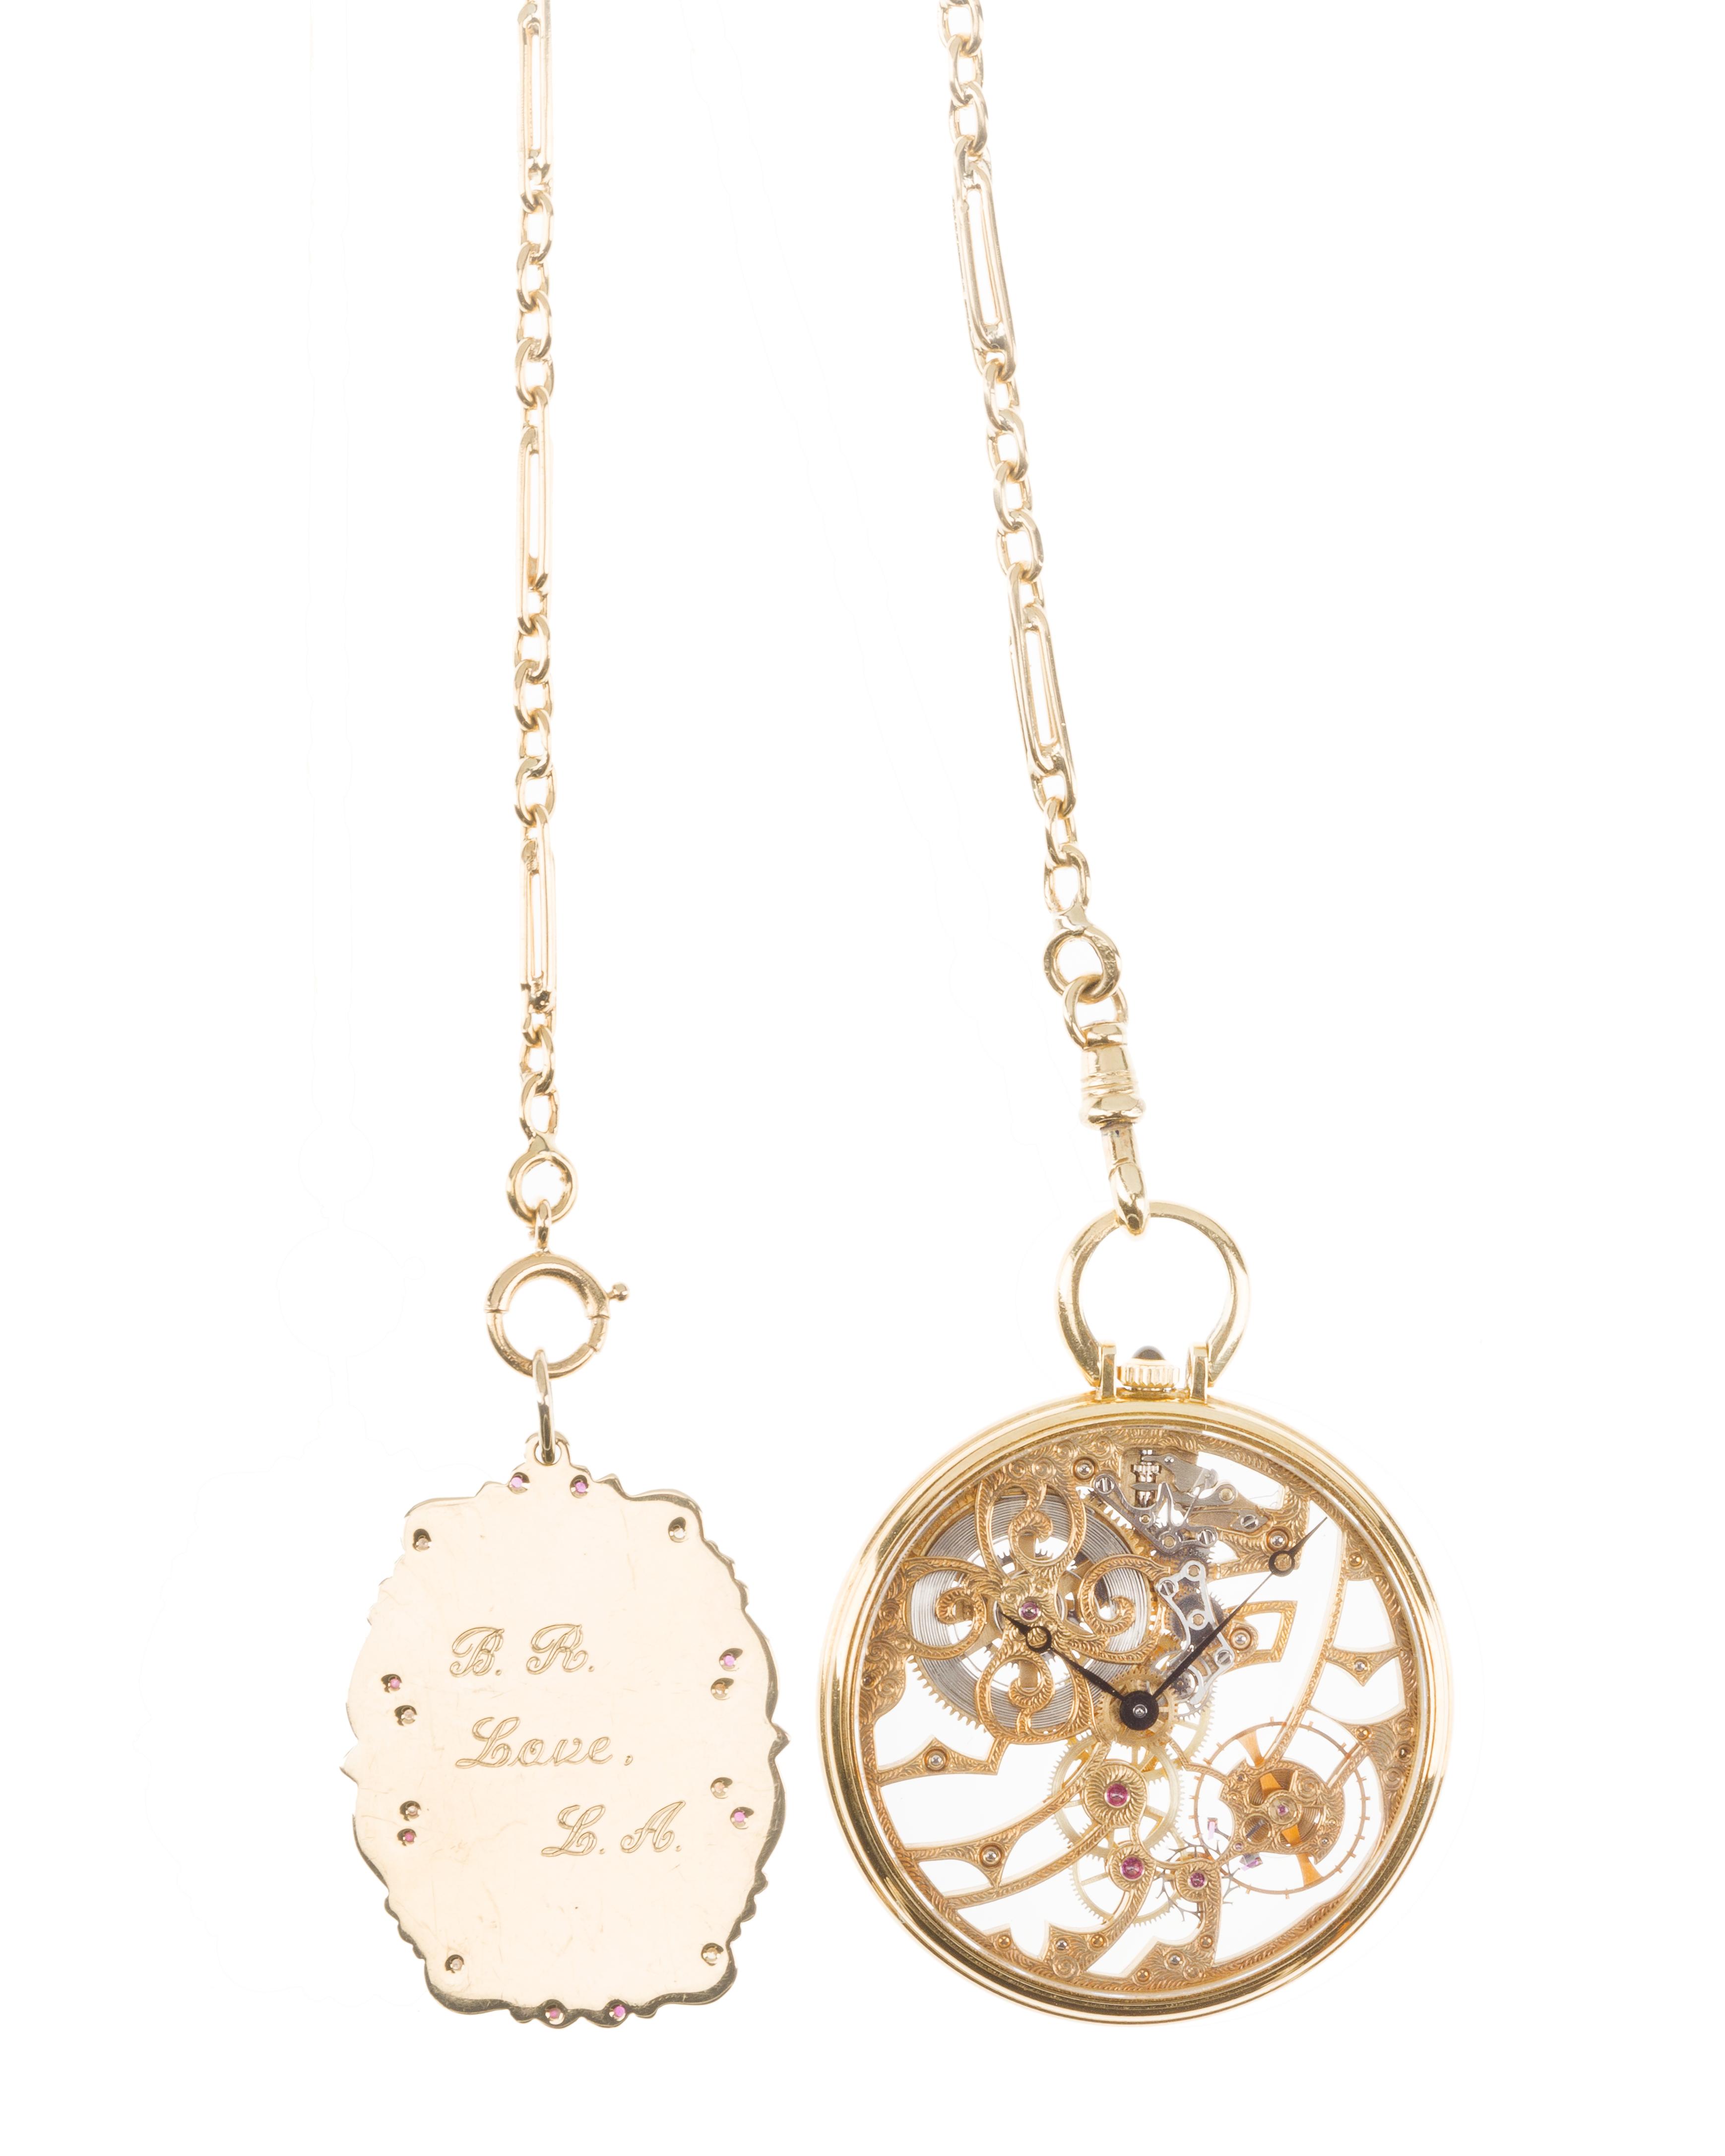 Burt Reynolds Rare Pocket Watch to Auction on May 21